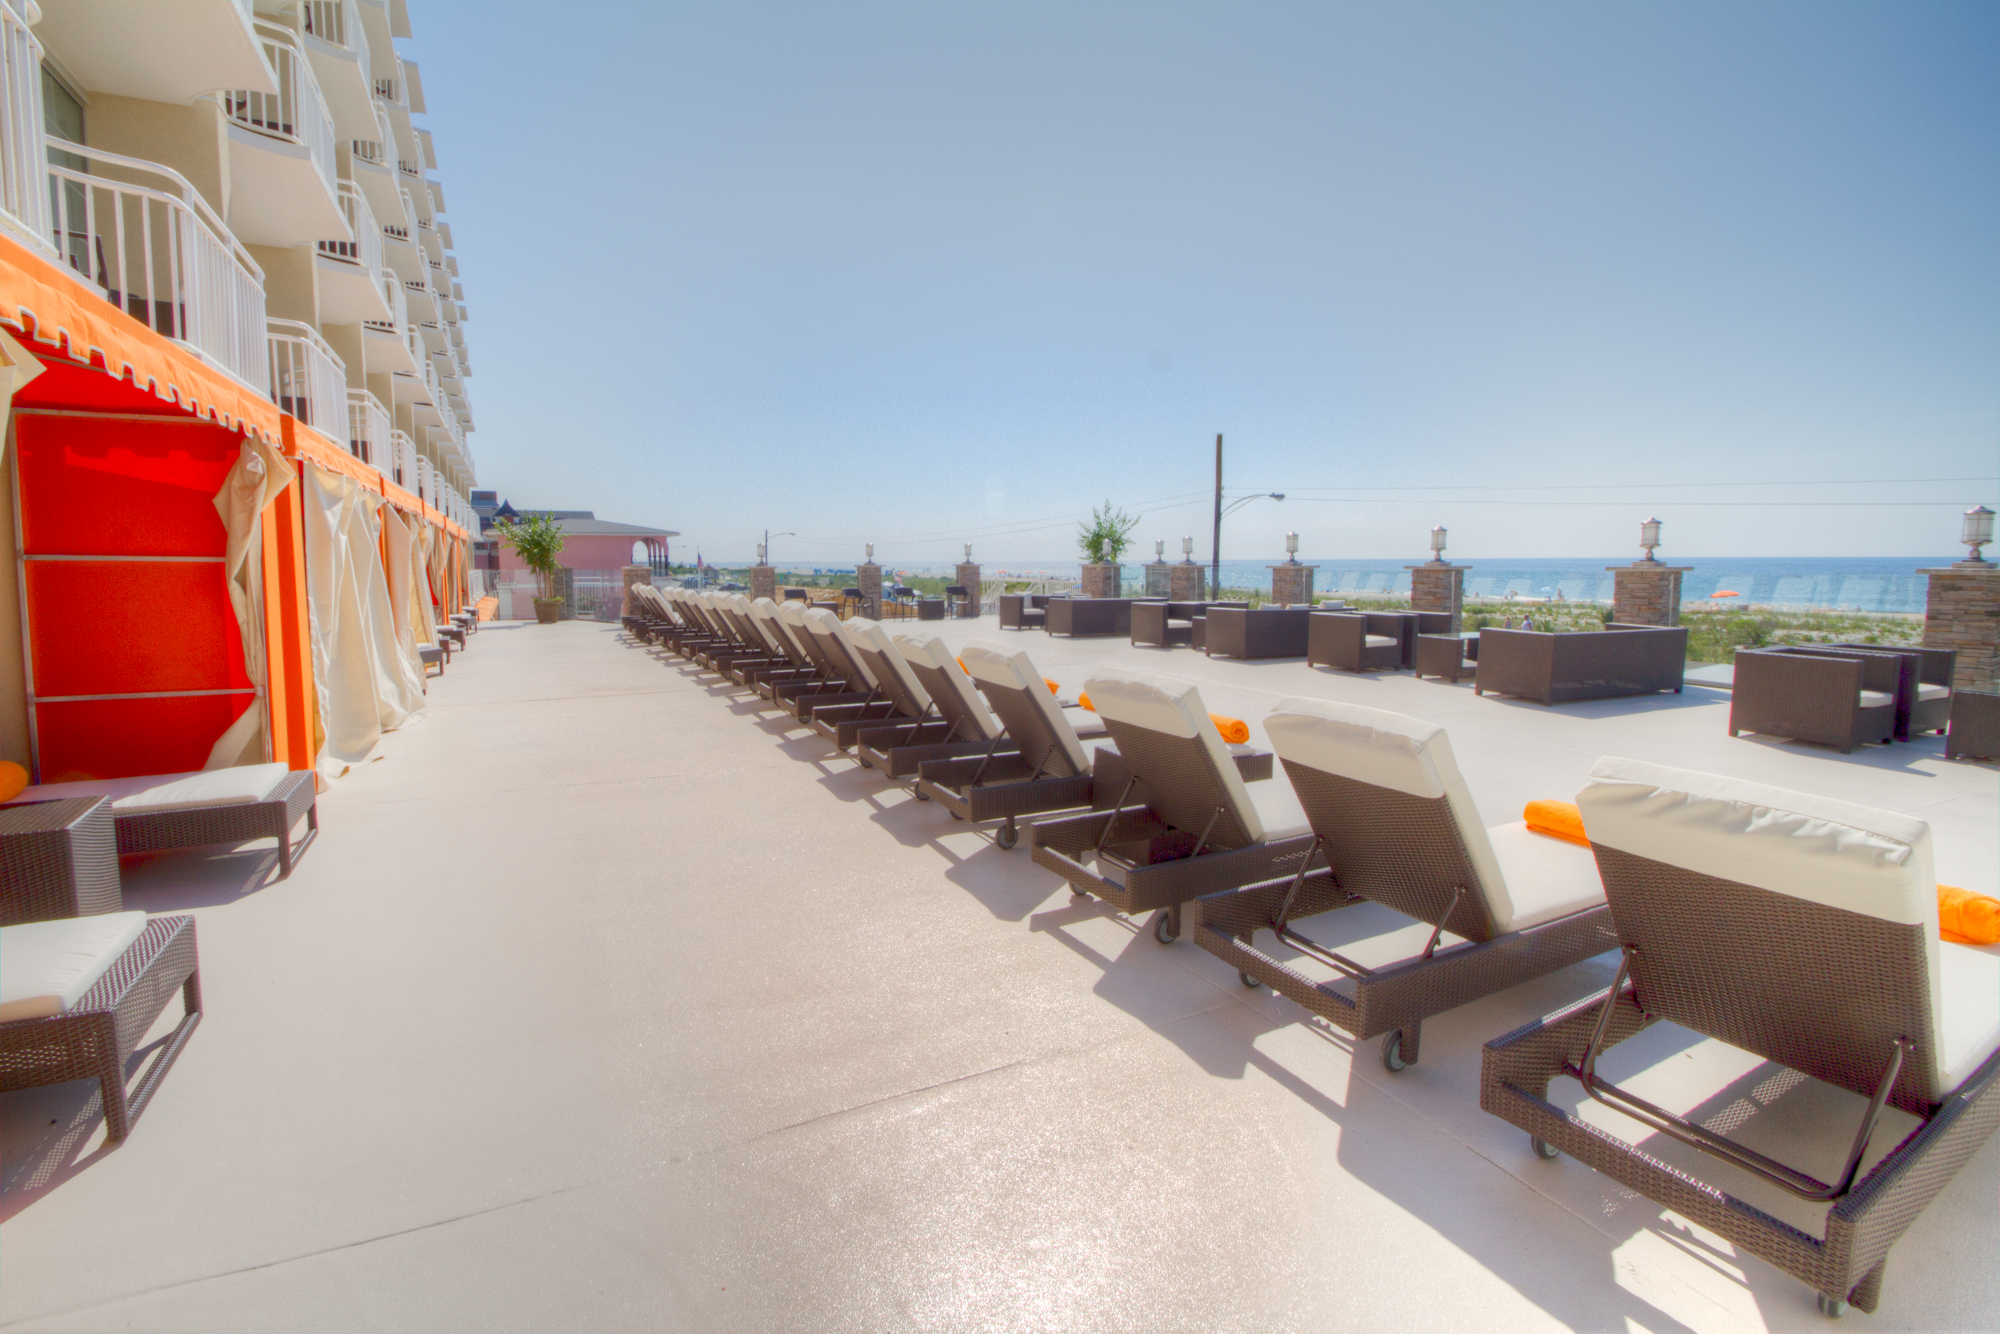 Ocean Club Hotel, Cape May NJ